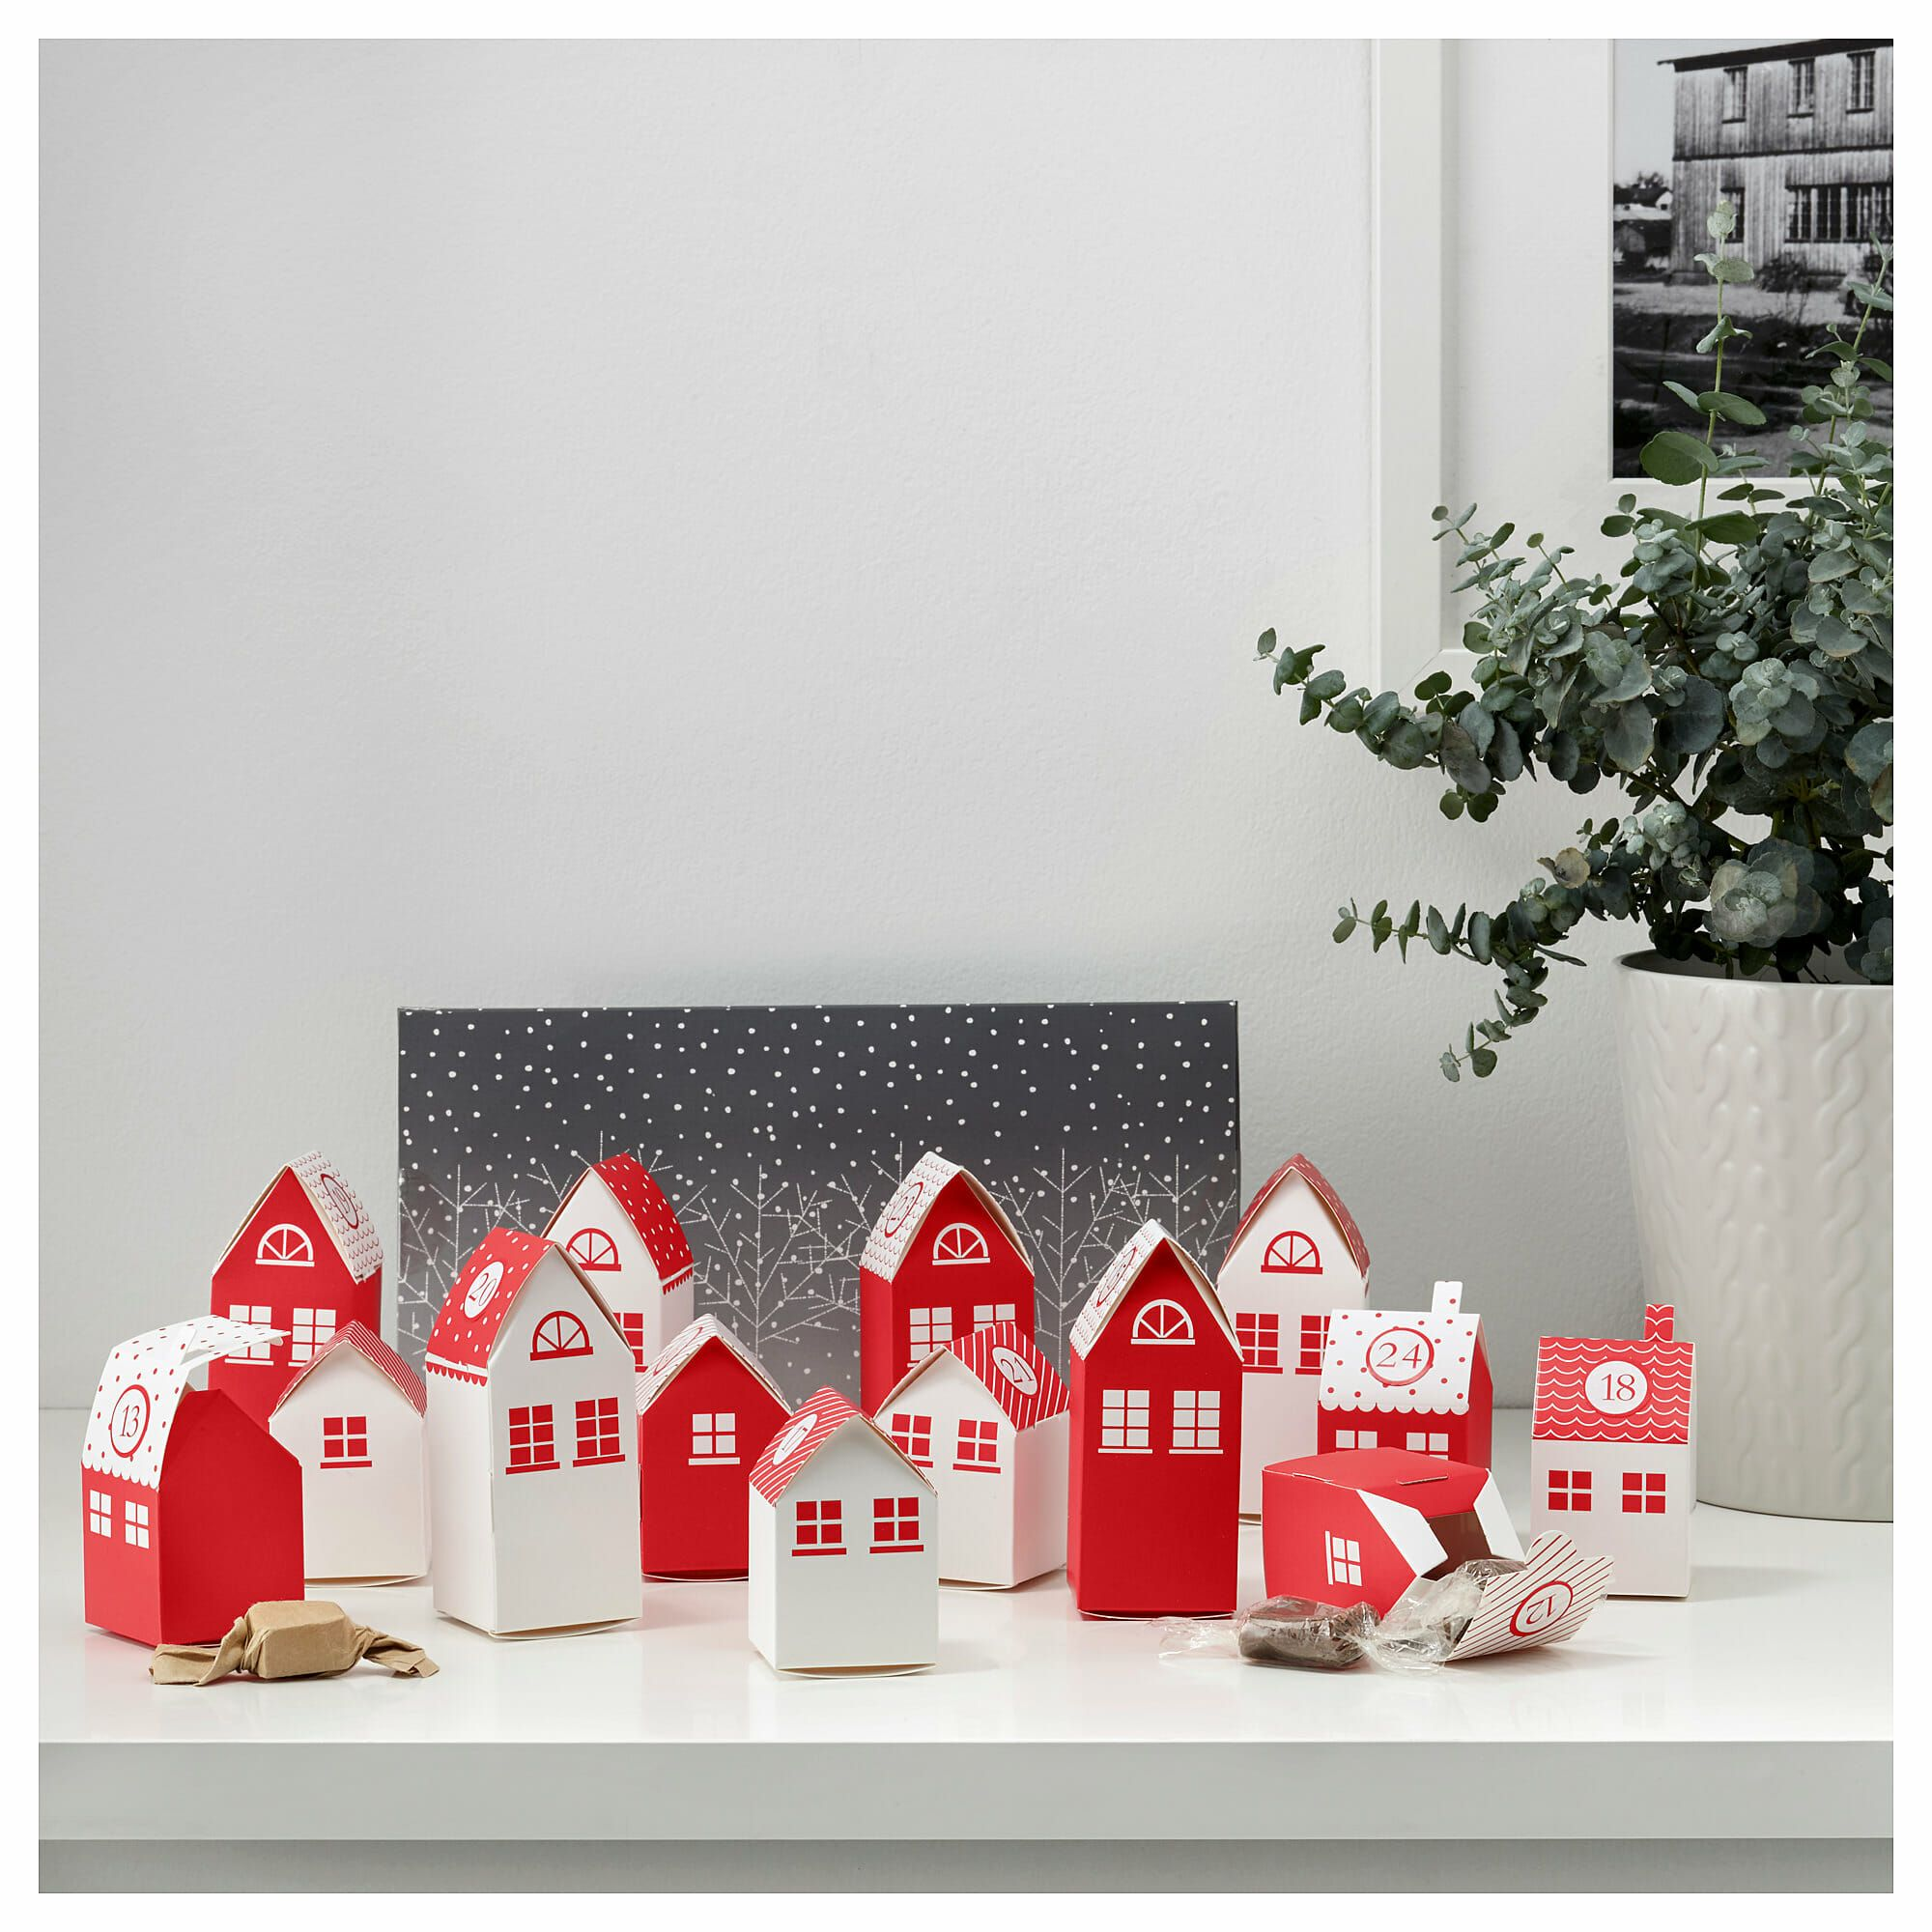 12 Beautiful Scandinavian Advent Calendars To Buy Little Scandinavian In 2020 Ikea Christmas Christmas Decor Inspiration Advent Calendar House